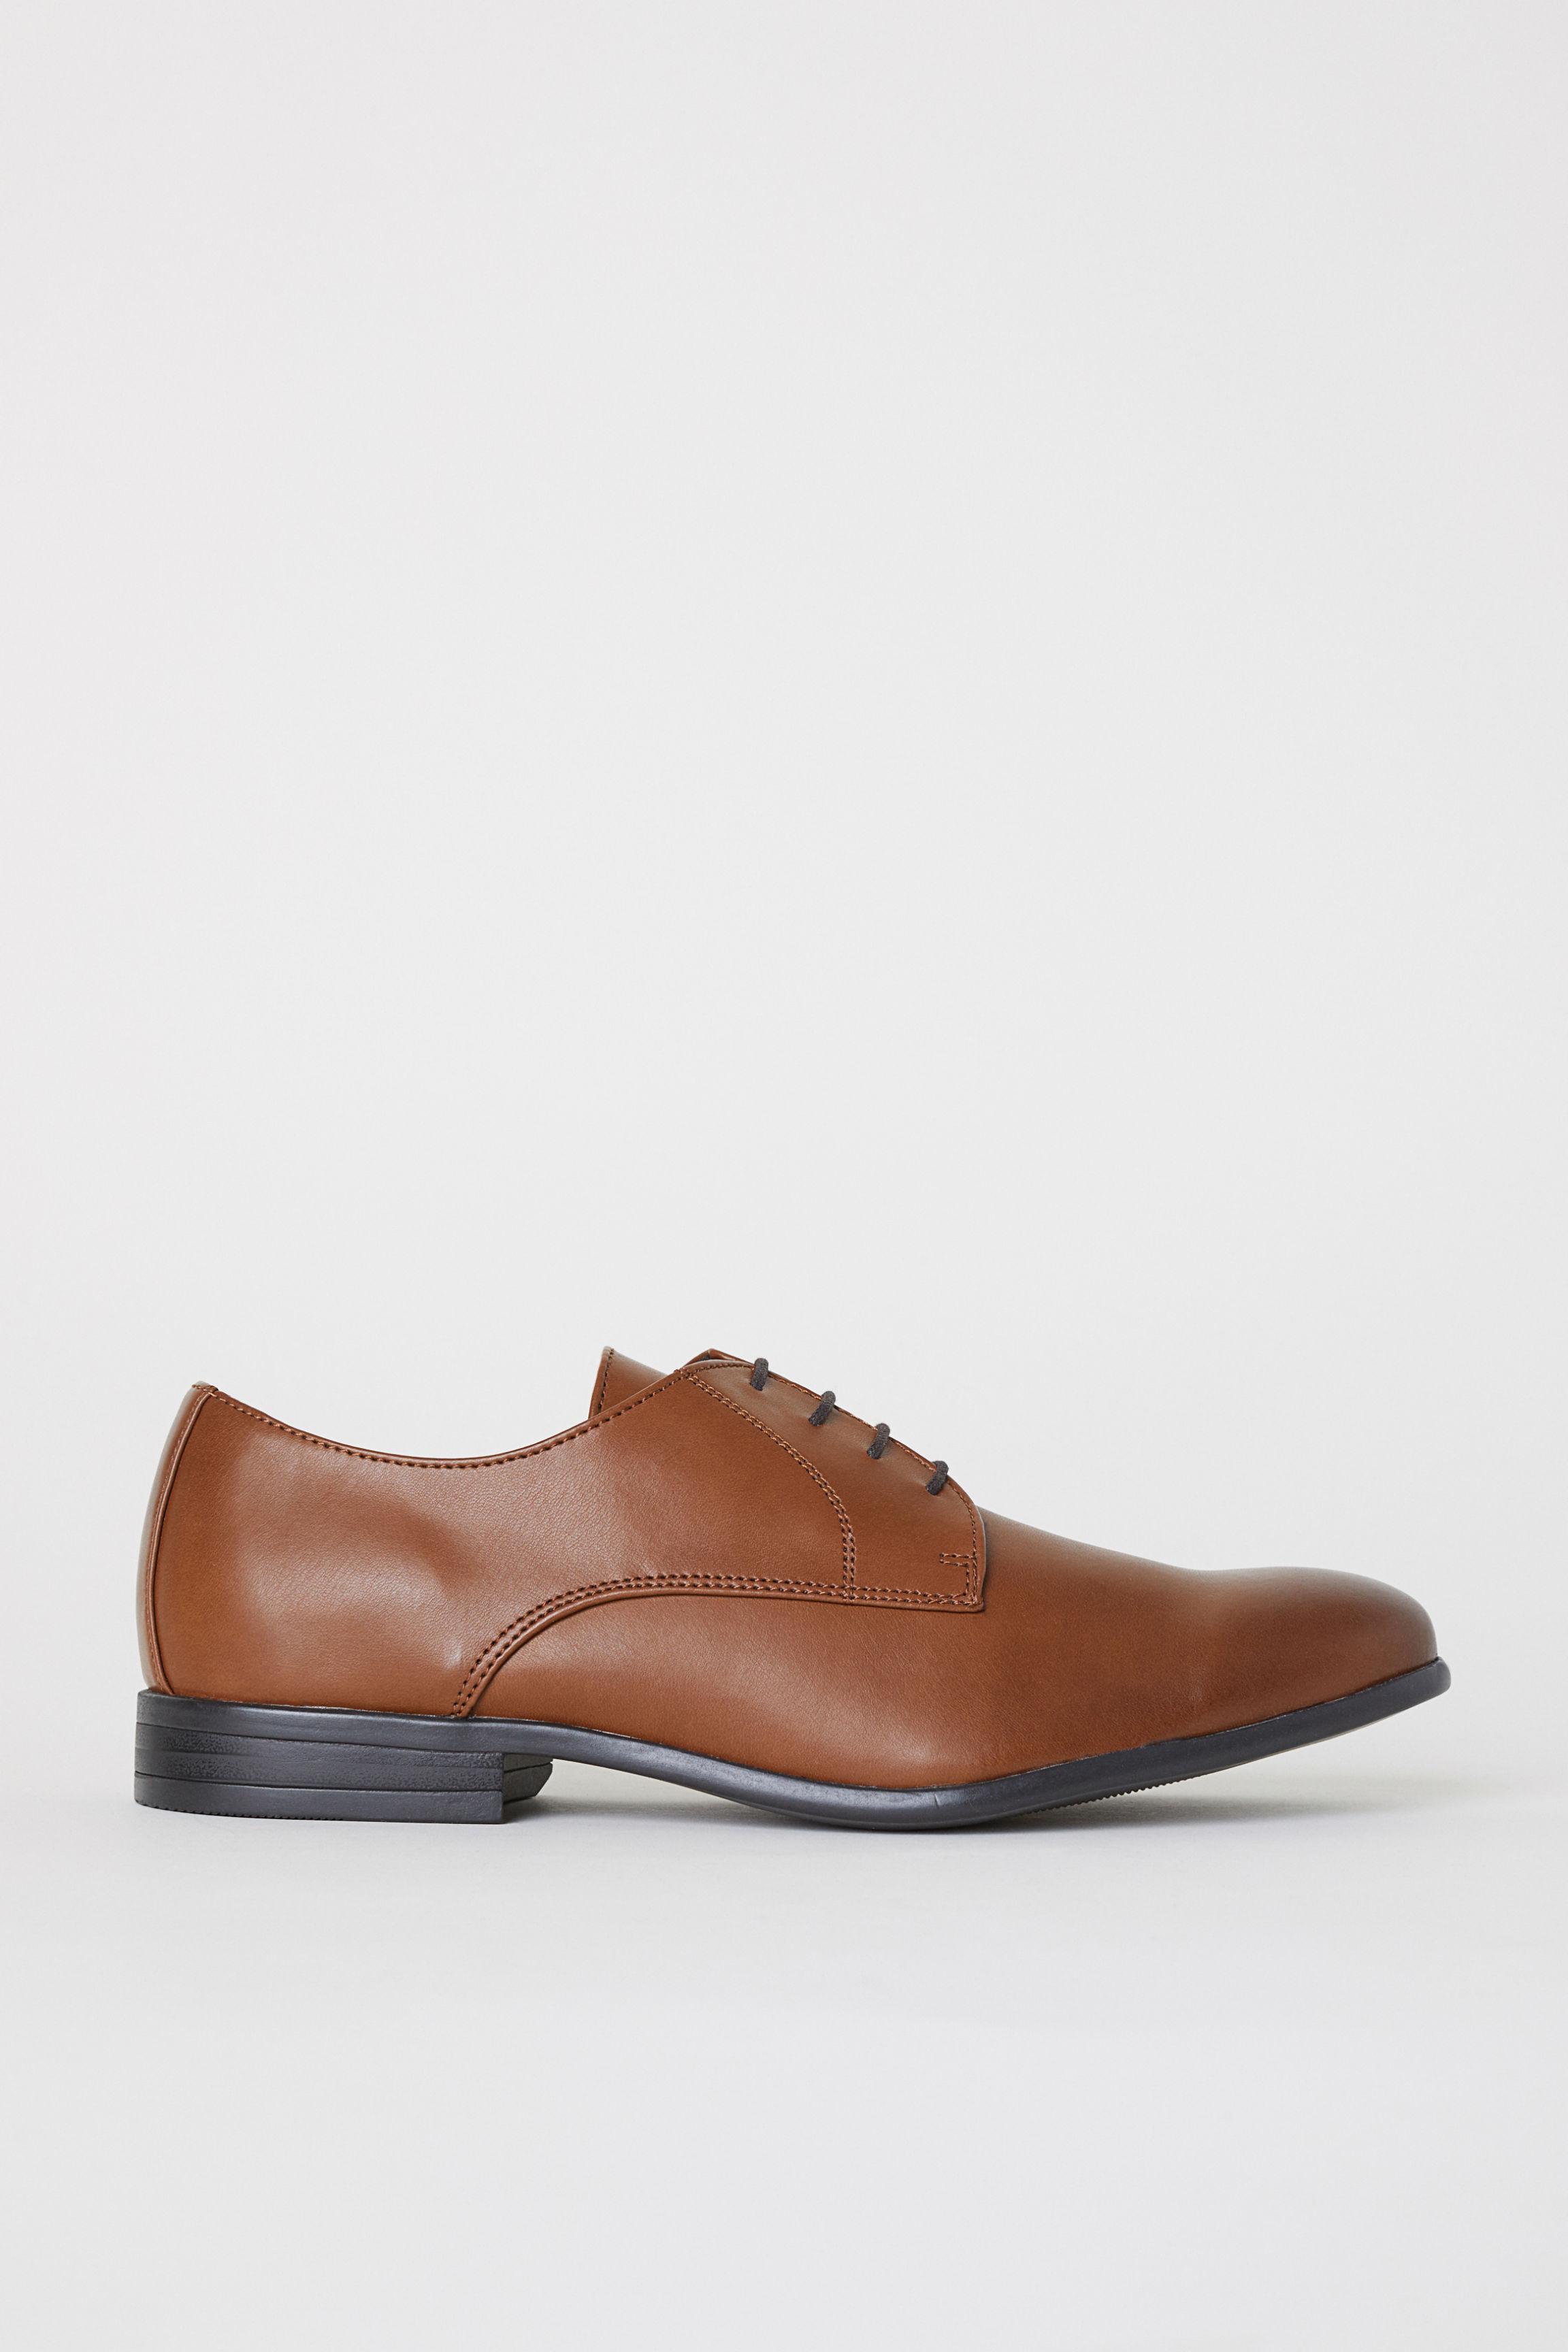 0a960c8136b1 Derby Shoes - Tawny brown - Men